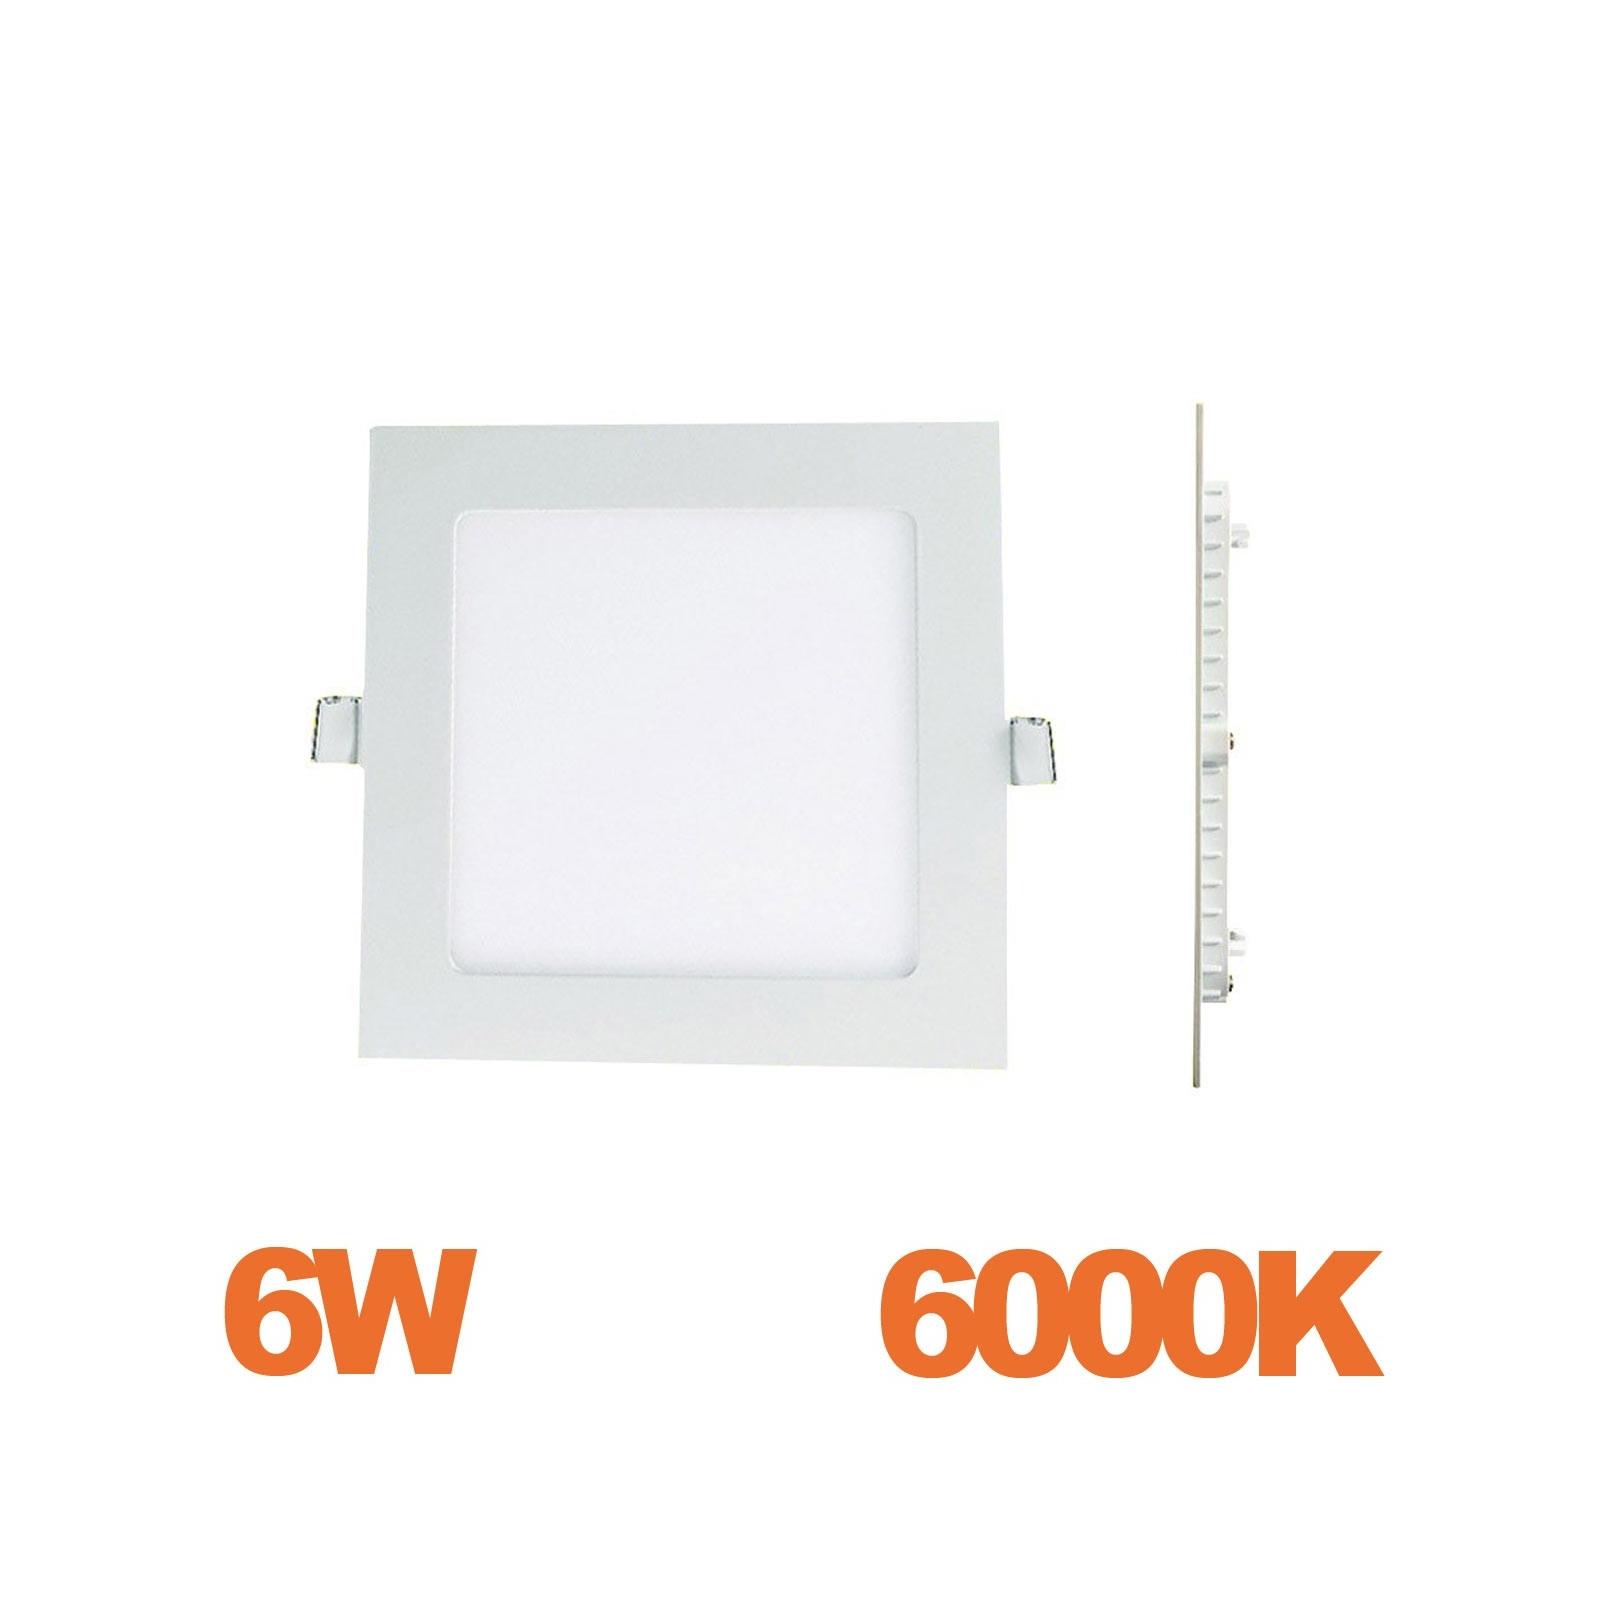 Spot Encastrable LED Carre Downlight Panel Extra-Plat 6W Blanc Froid 6000K